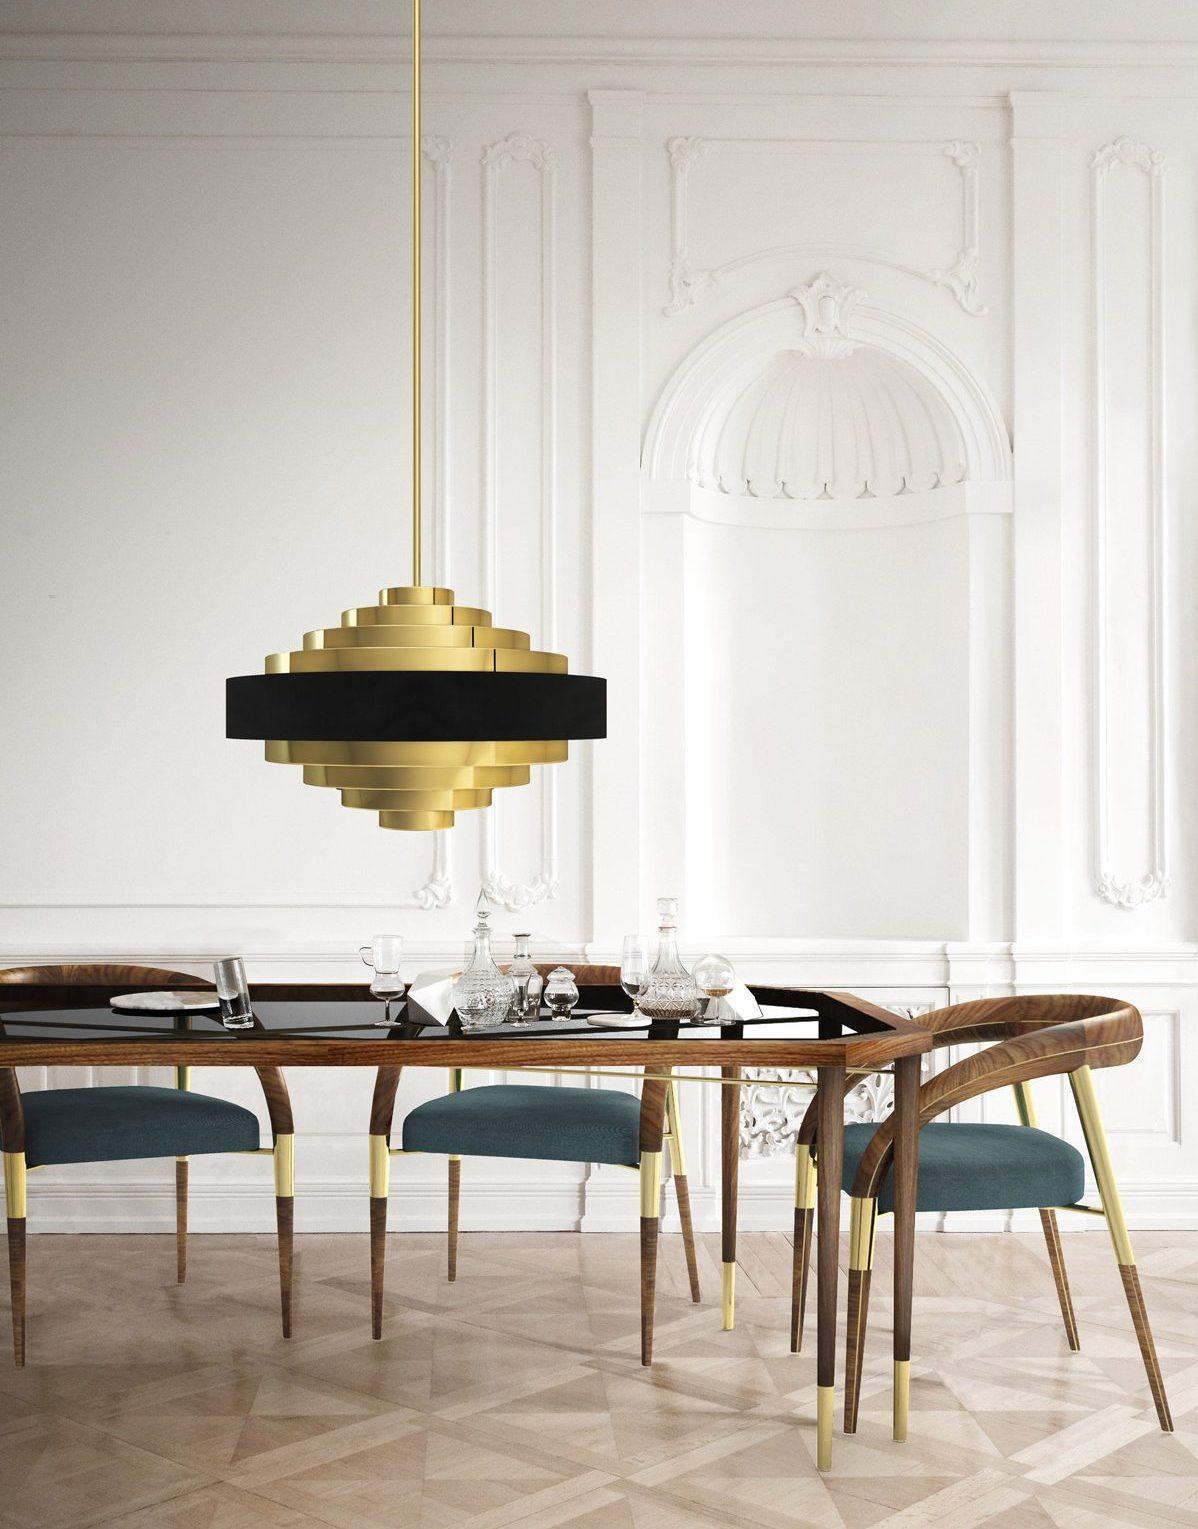 furniture, Behind the Scenes with Ana Azevedo, Kassavello